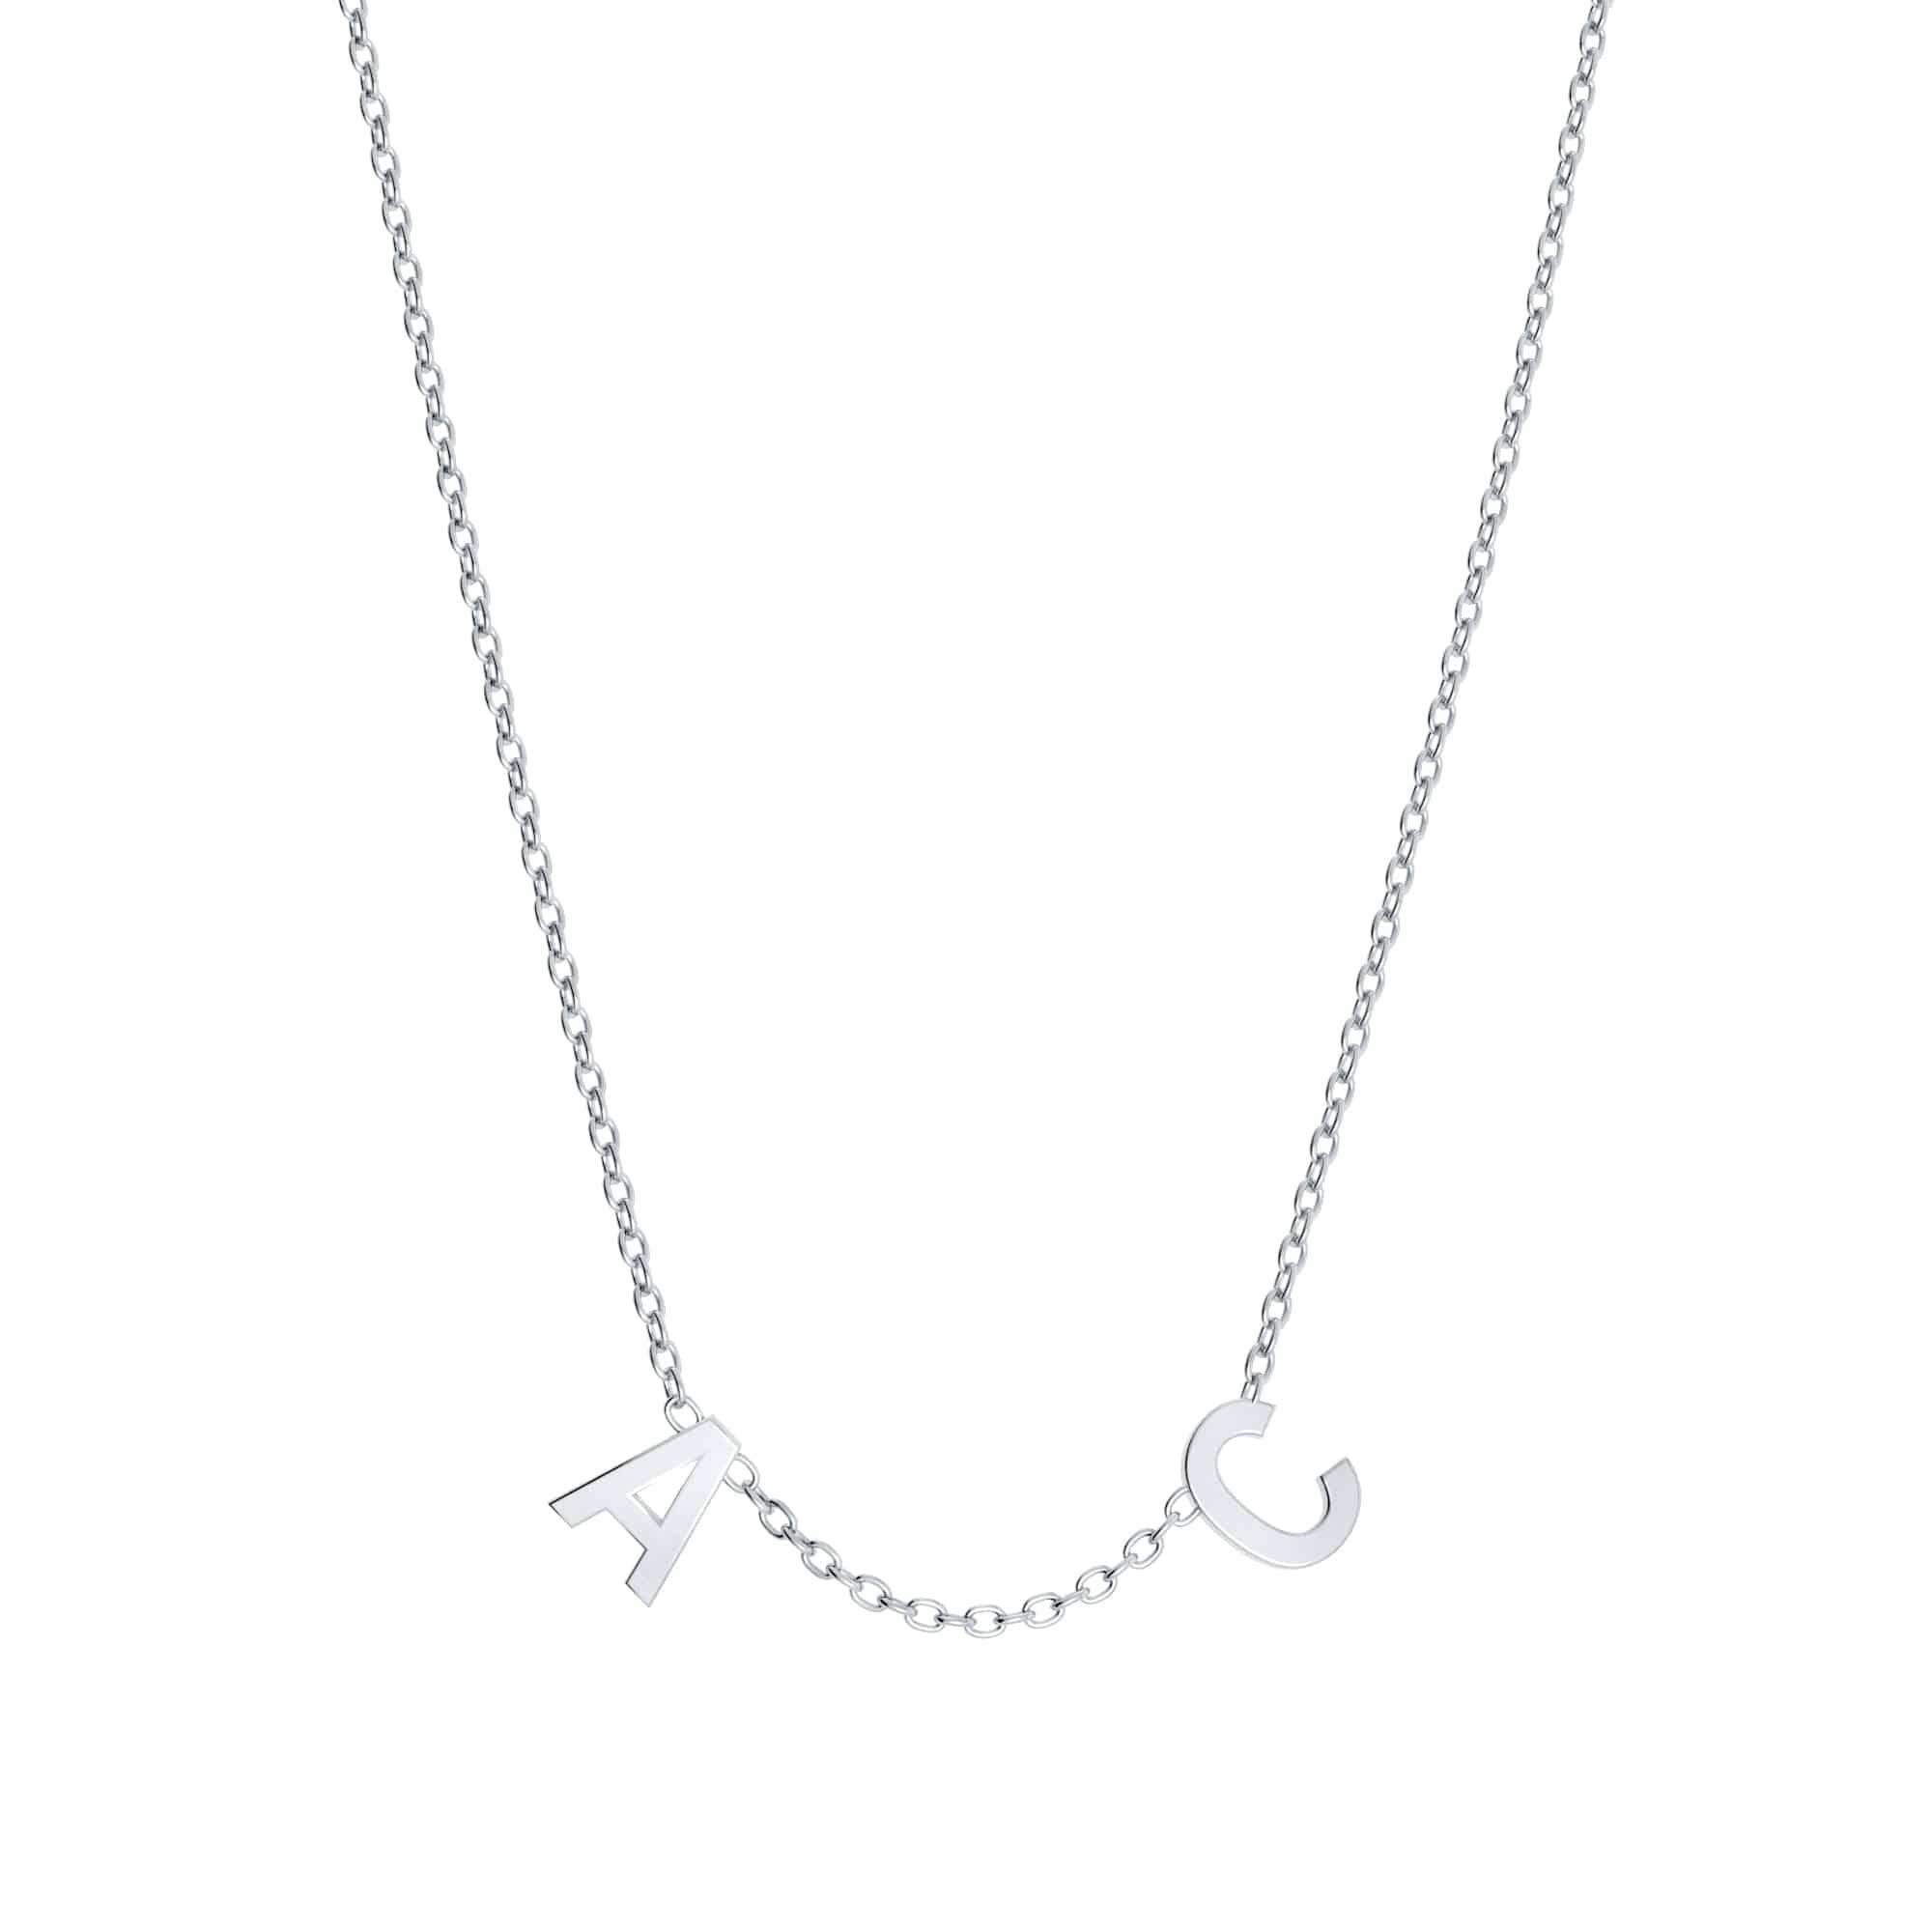 Collier lettres personnalisée - Or blanc 18 carats